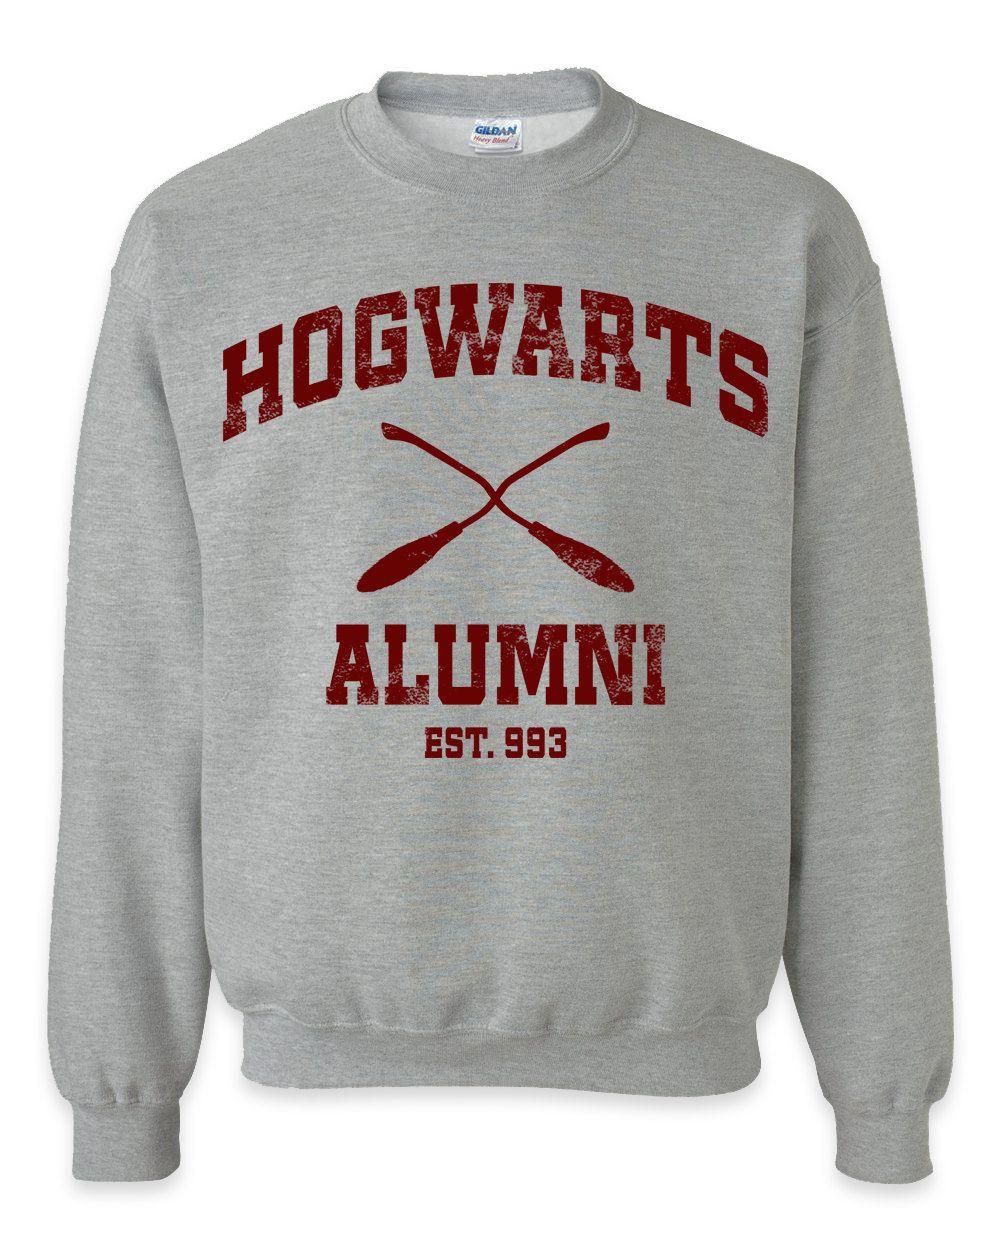 Hogwarts Alumni Grey Crewneck Sweatshirt Hufflepuff Hogwarts Gryffindor Crewneck Sweatshirt Slytherin Quidditch Hogwarts Alumni Sweatshirts Unisex Sweatshirt [ 1250 x 1000 Pixel ]